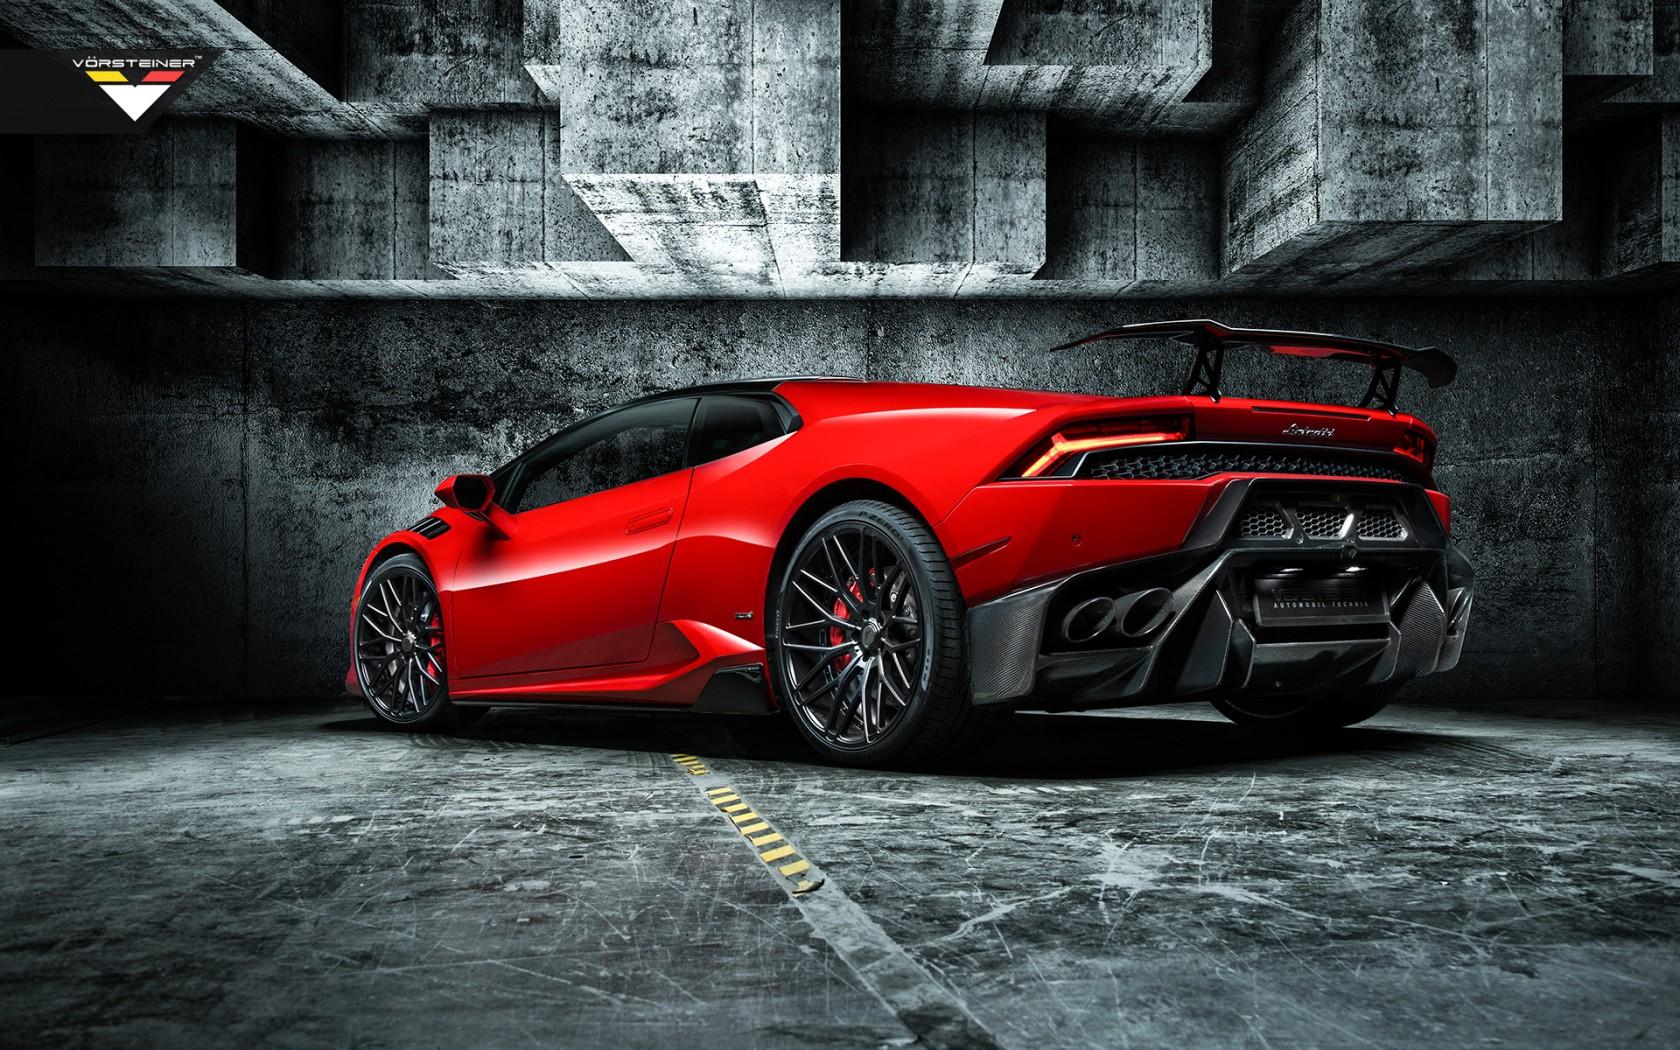 Cars Hd Wallpapers 1080p For Pc Bmw 2016 Rosso Mars Novara Edizione Lamborghini Huracan 3